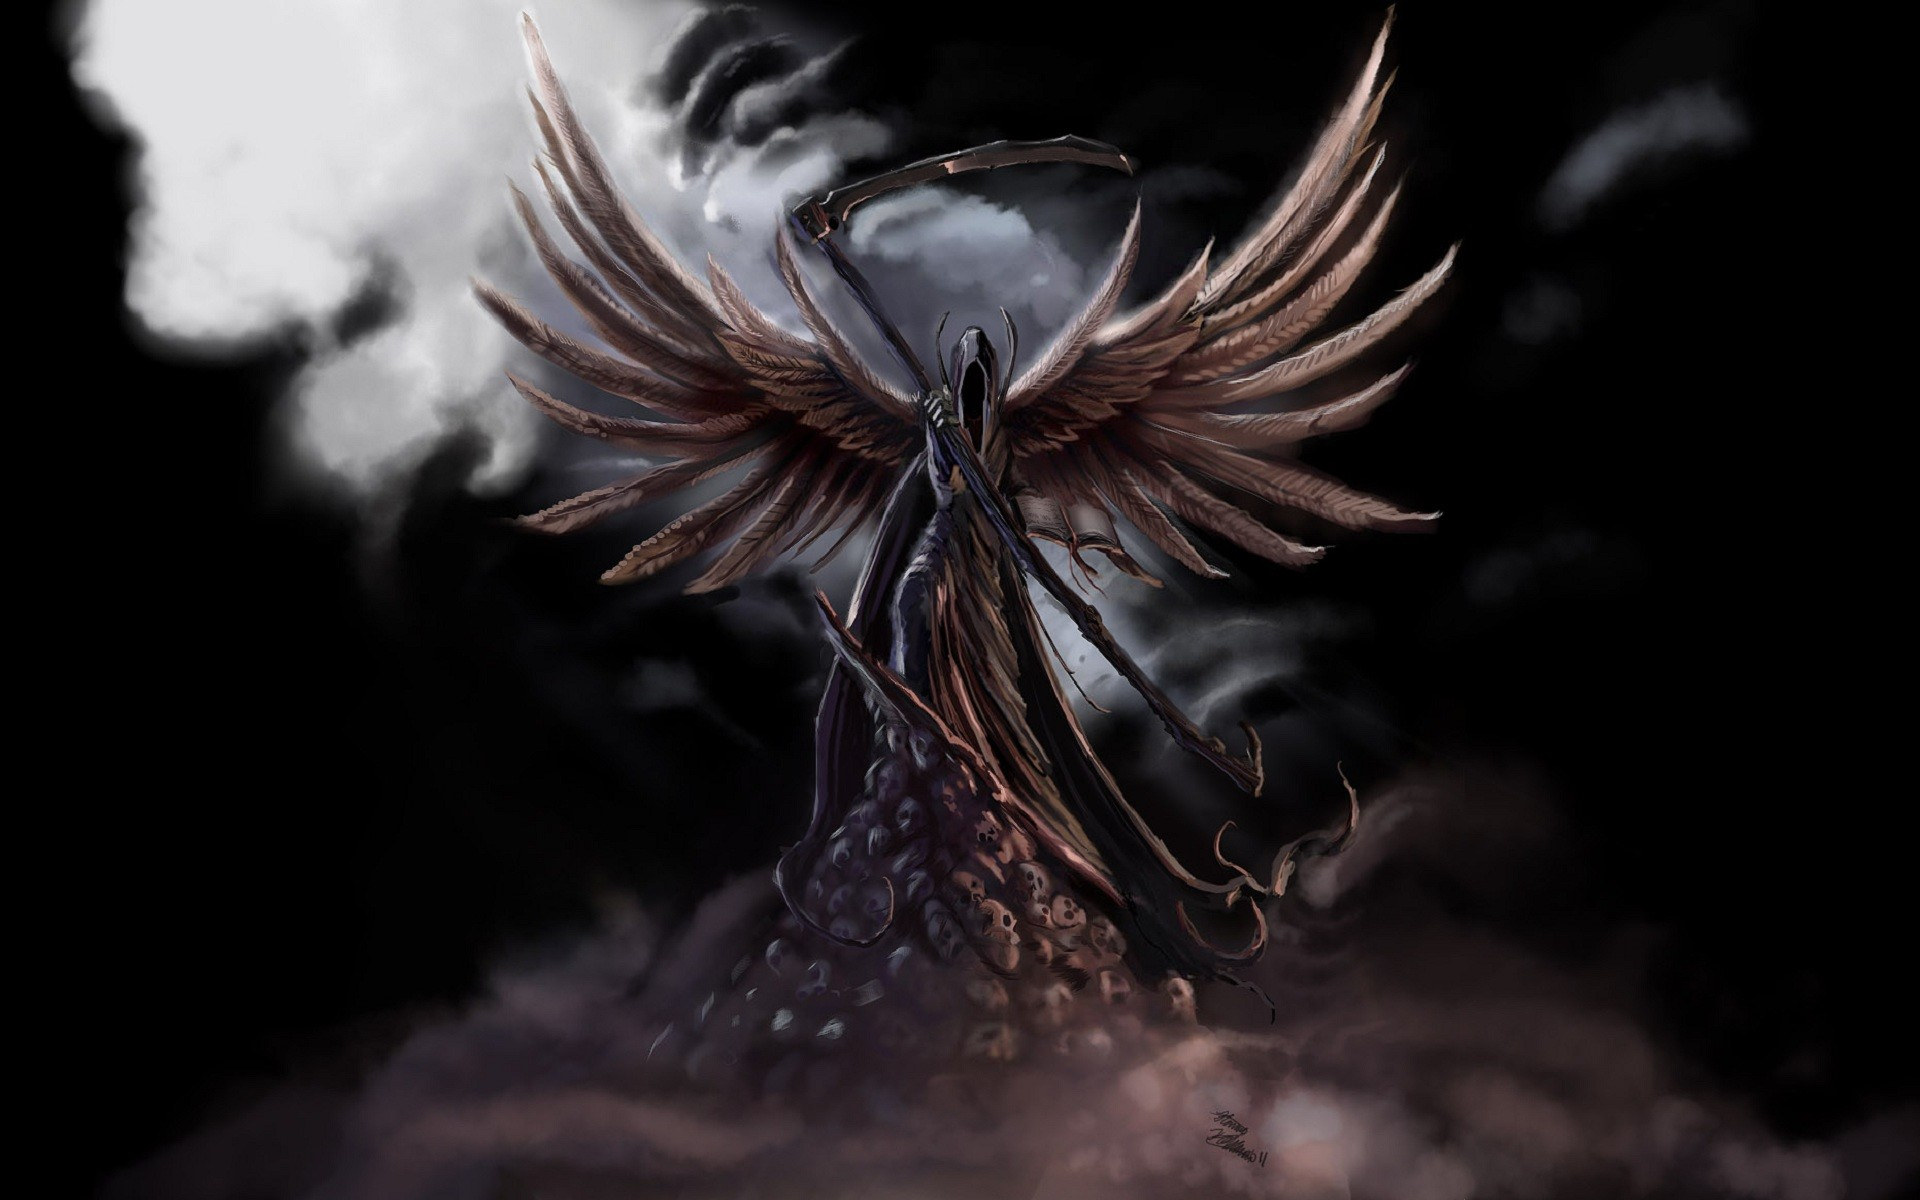 Dark Grim Reaper horror skeletons skull creepy wings angel wallpaper